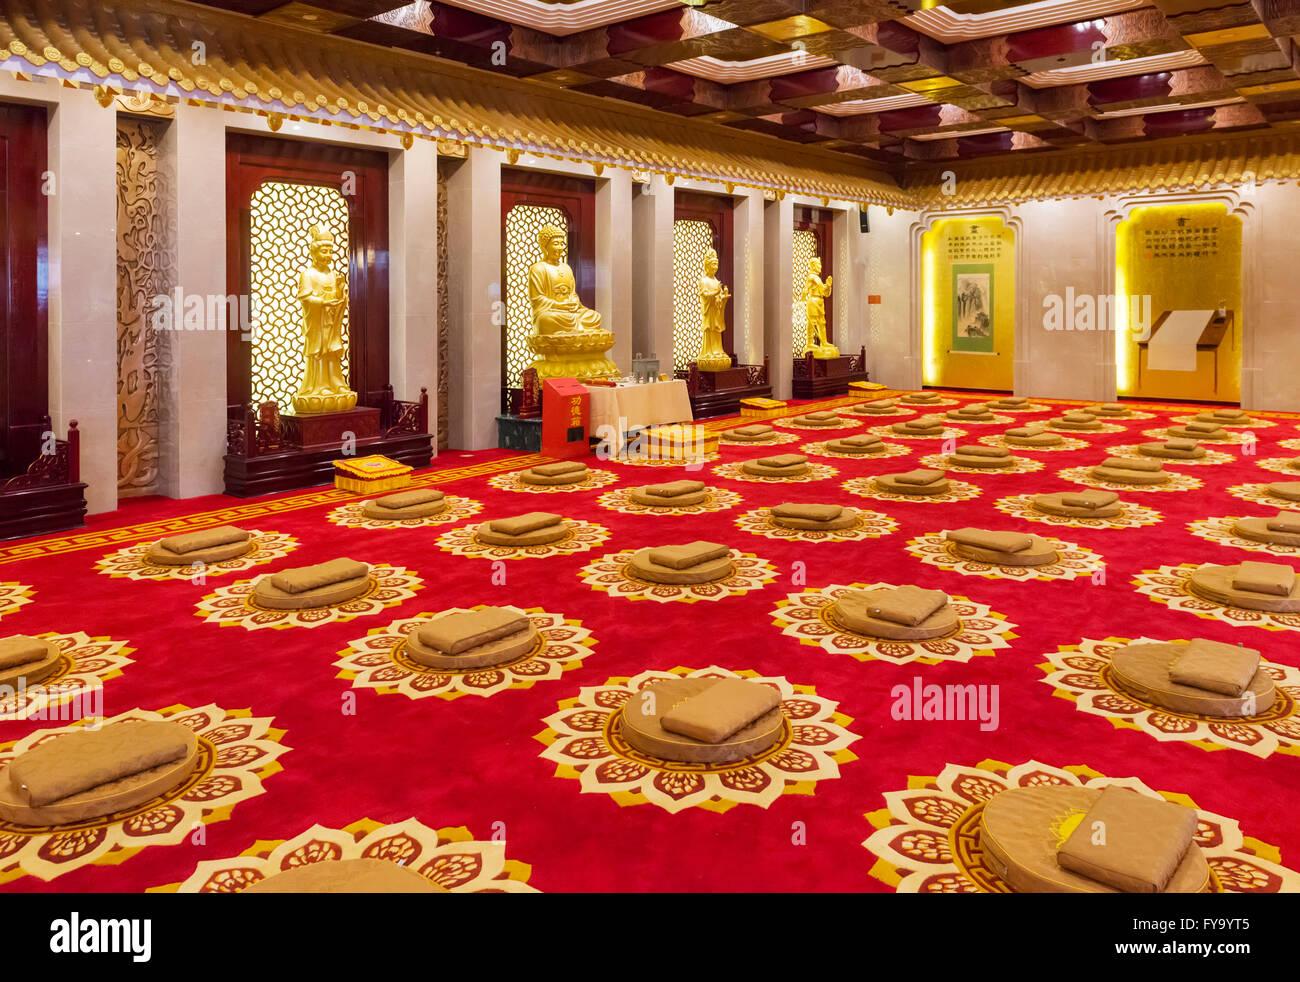 Décoration Salle De Méditation salle de méditation, chan wu hotel à dengfeng, zhengzhou